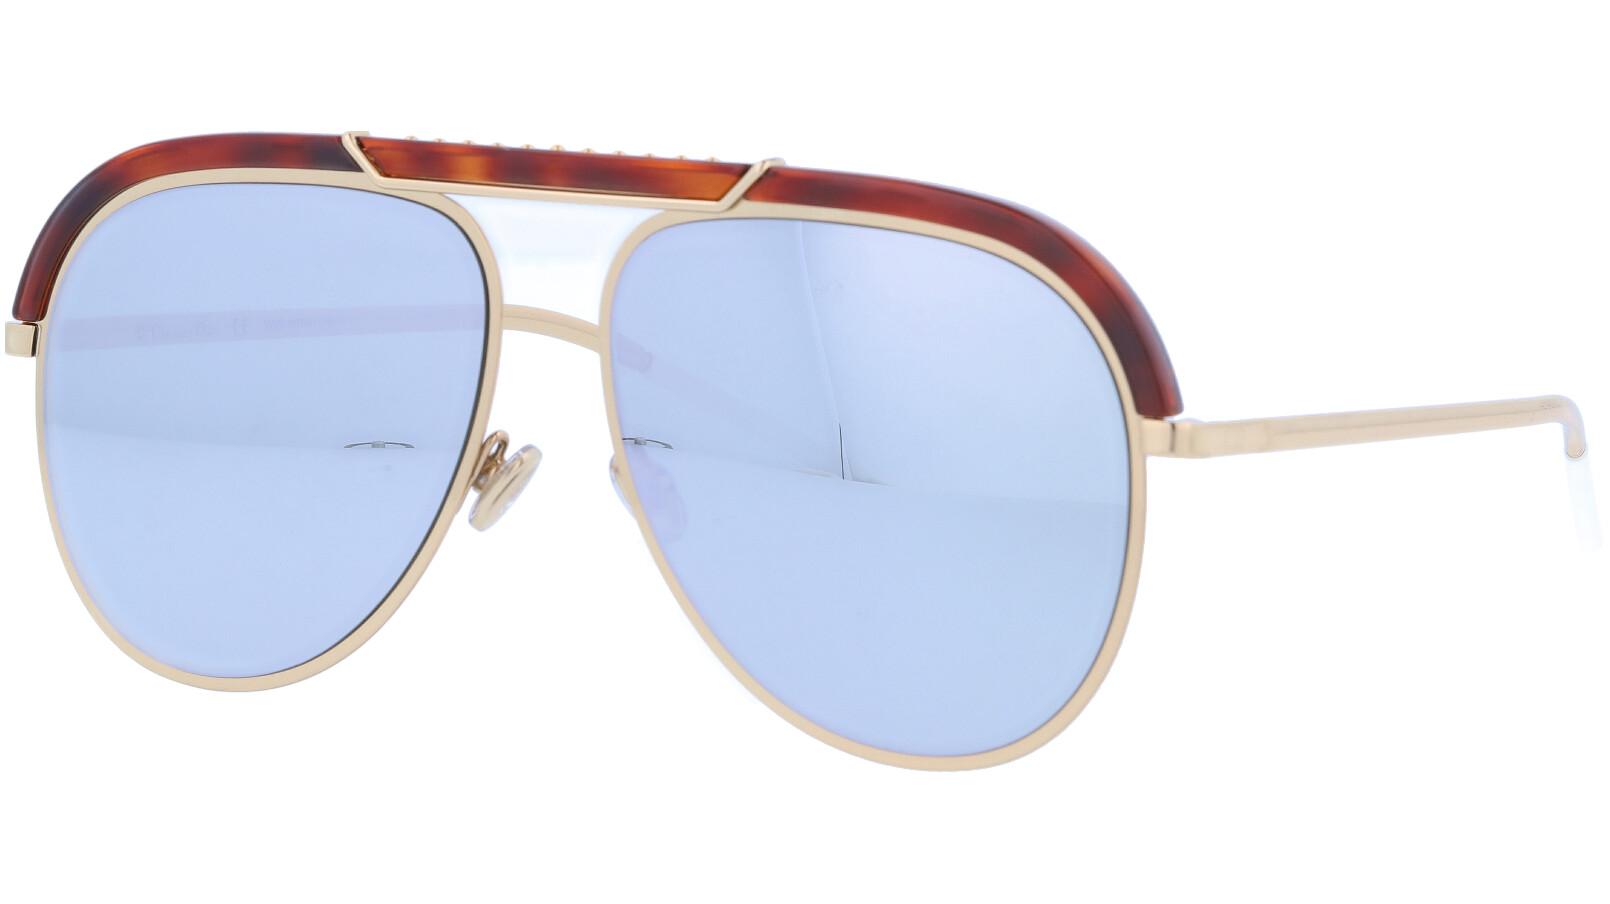 DIOR DIORDESERTIC 2IK0T 58 HAVANA Sunglasses